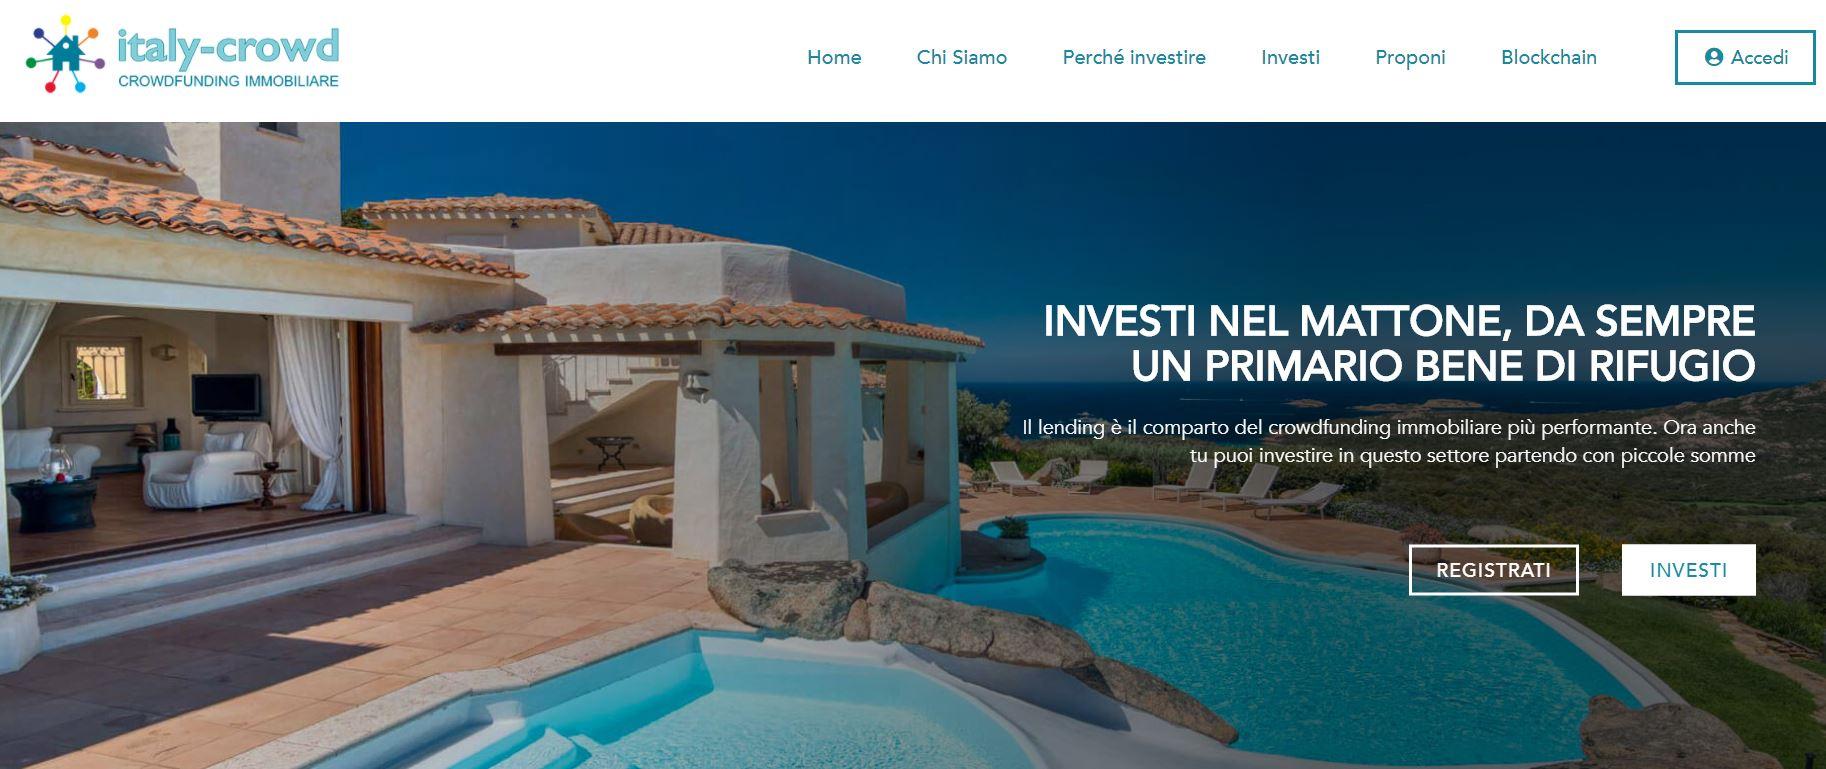 italy crowd crowdfunding immobiliare